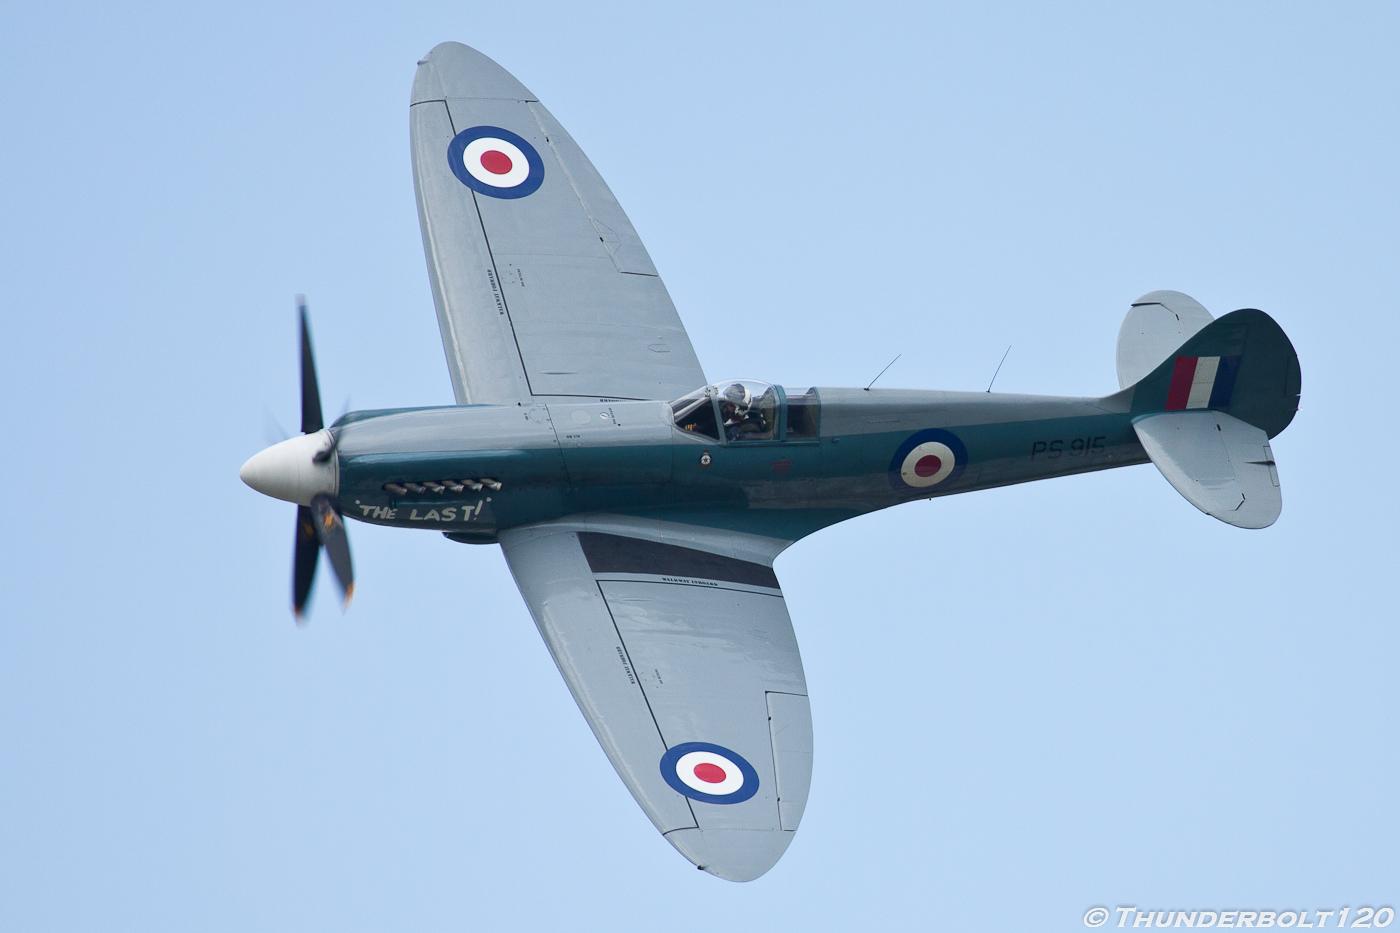 Spitfire PS915 Mk PRXIX